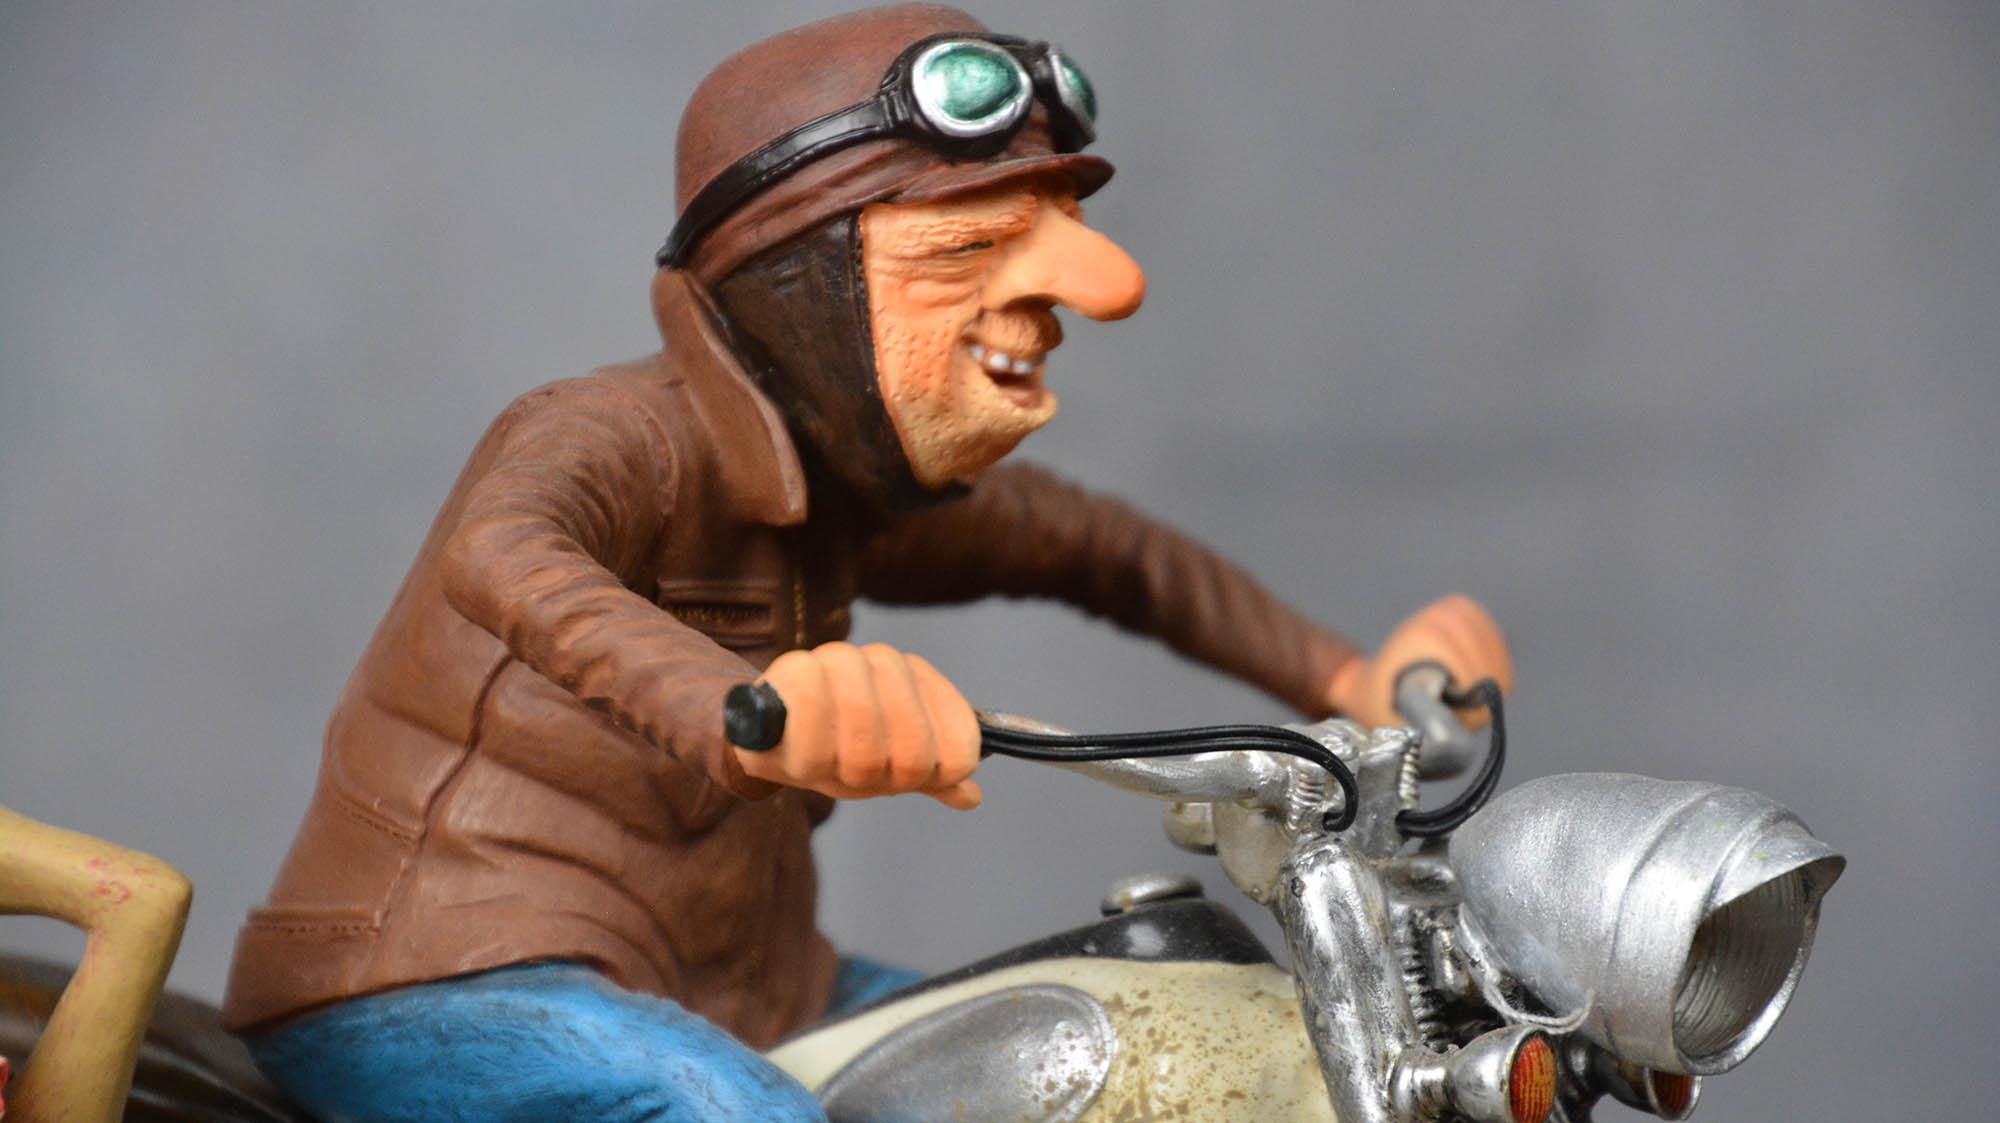 boutique figurine piece artisanale vehicule side car parodie